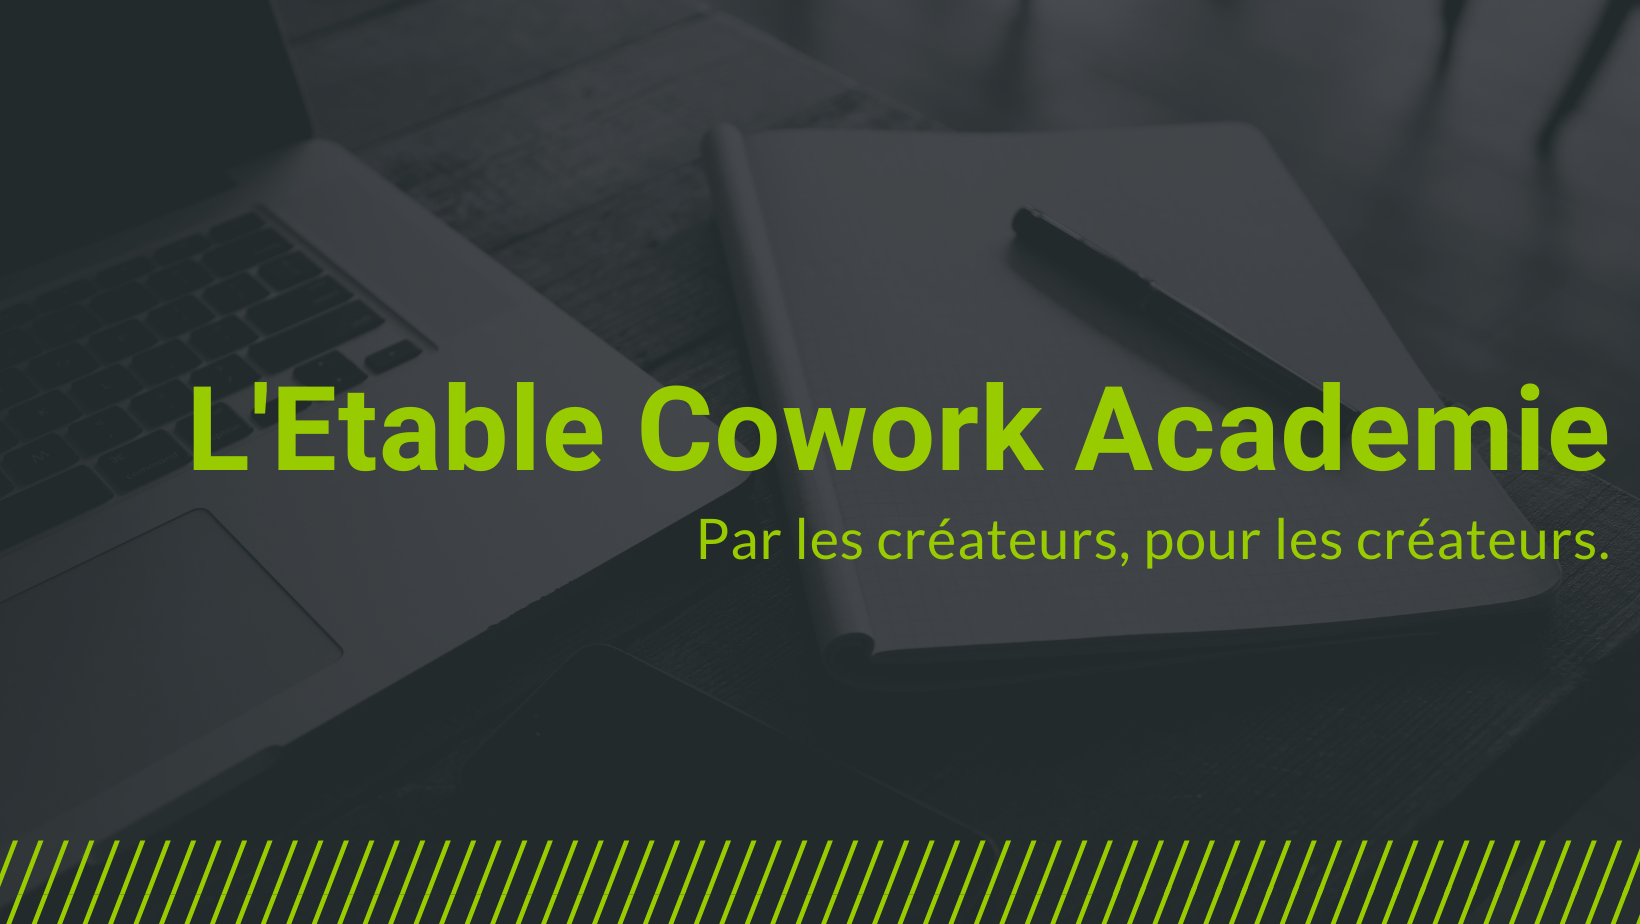 L'etable Cowork Academie